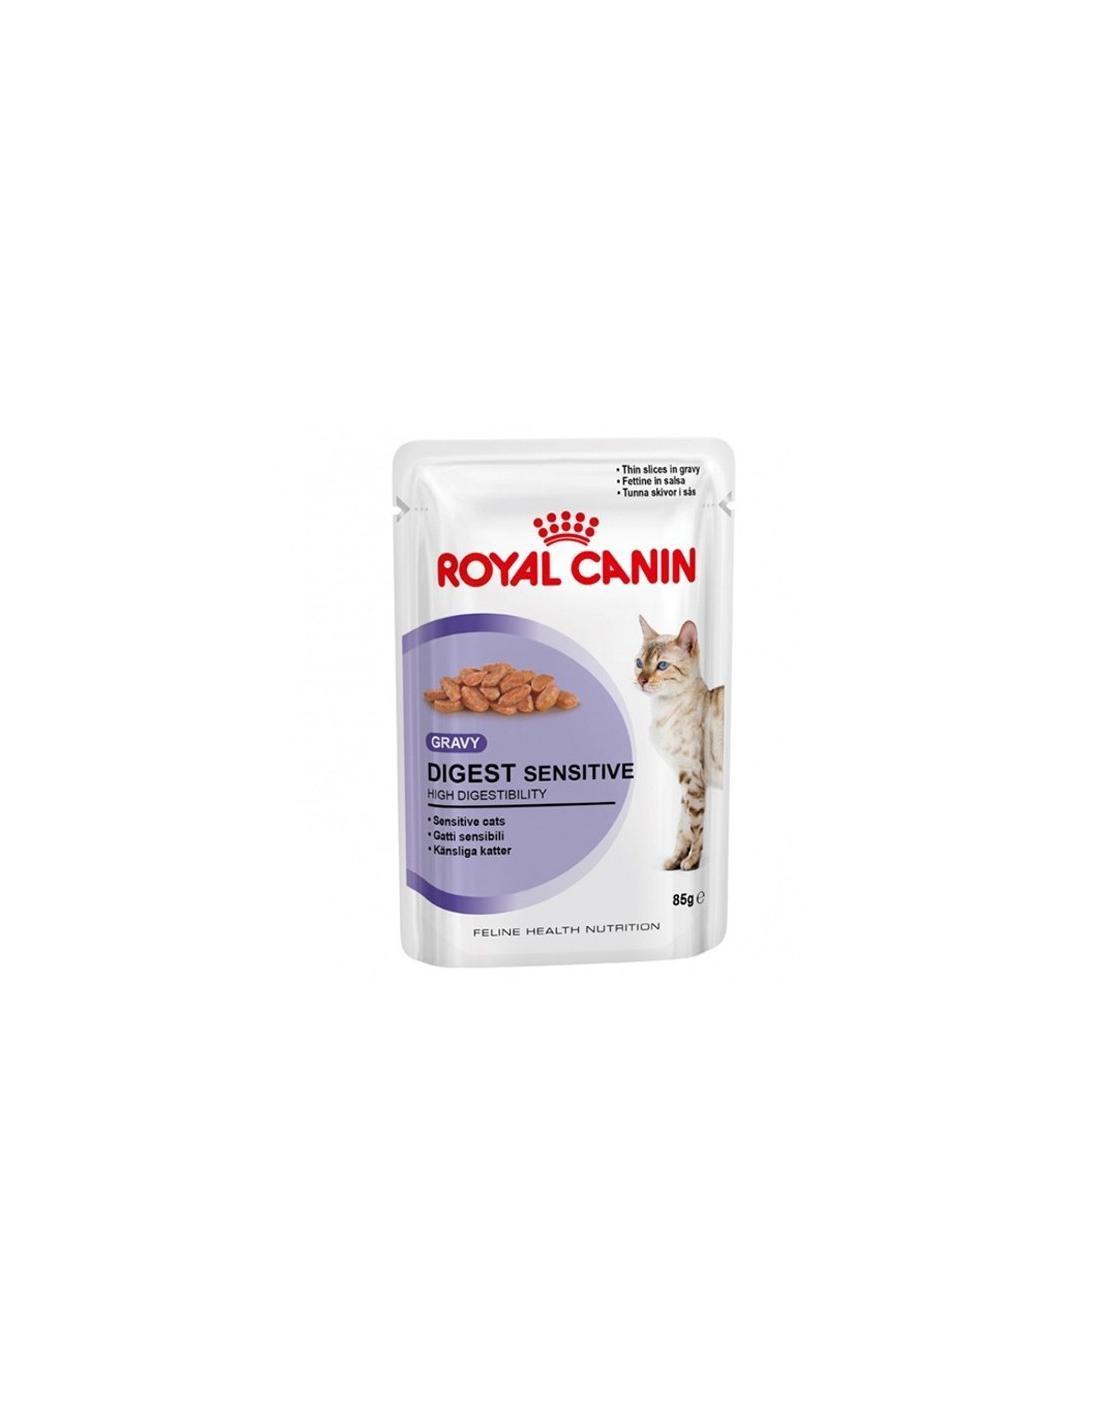 DIGEST SENSITIVE85G ROYAL CANIN